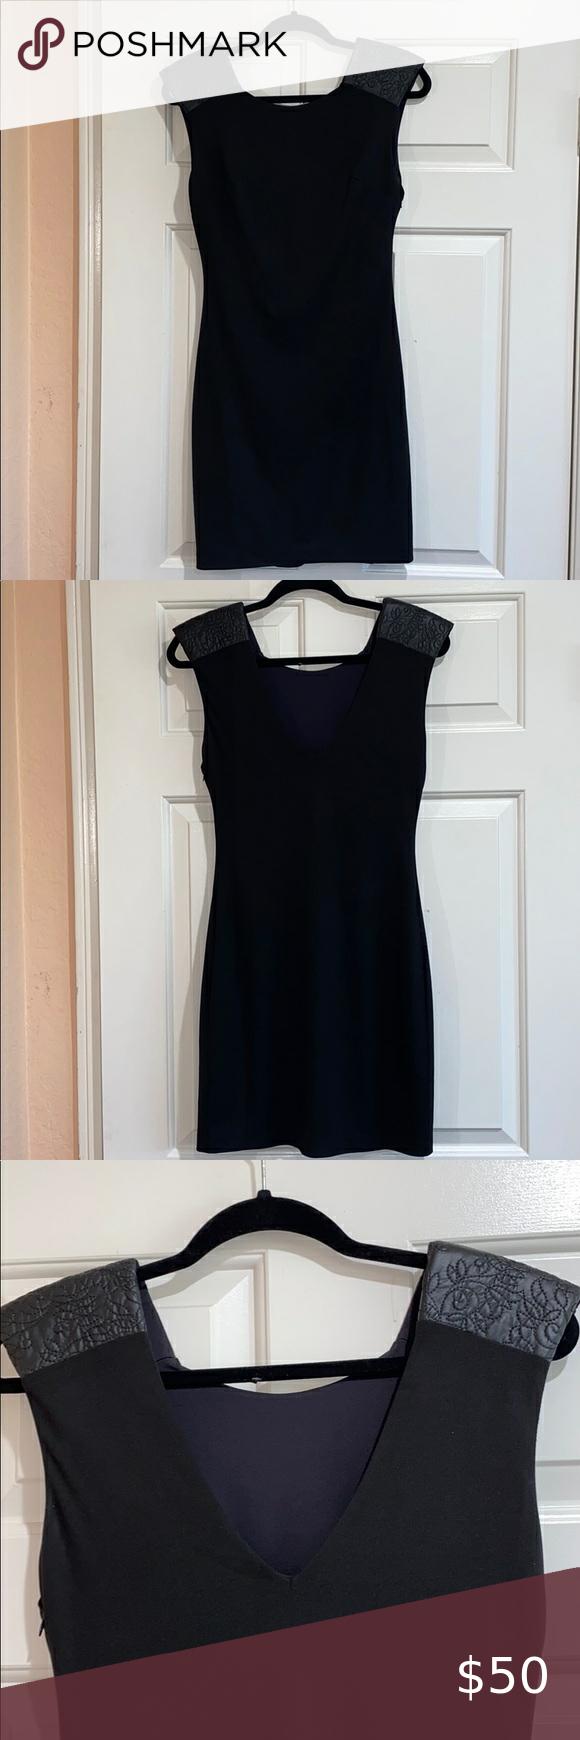 Guess Black Mini Dress W Leather Shoulder Pads Mini Black Dress Perfect Little Black Dress Dresses [ 1740 x 580 Pixel ]